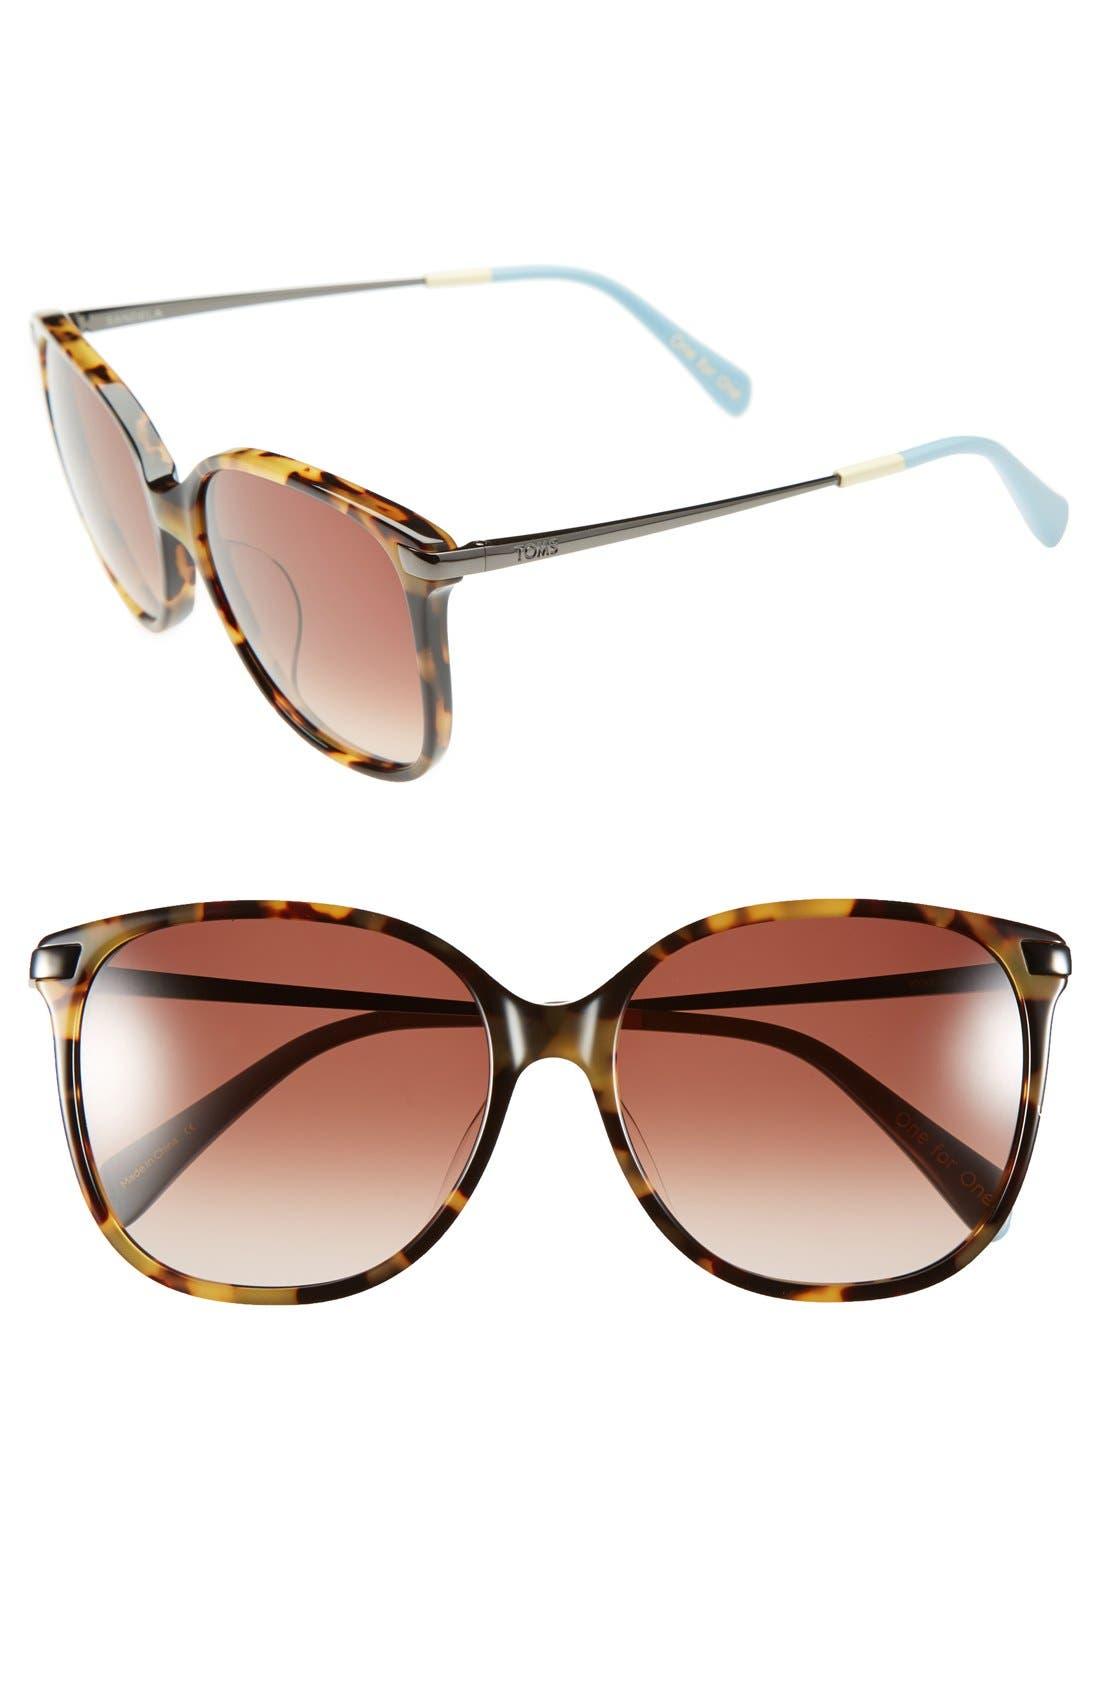 Main Image - TOMS 'Sandela' 56mm Sunglasses